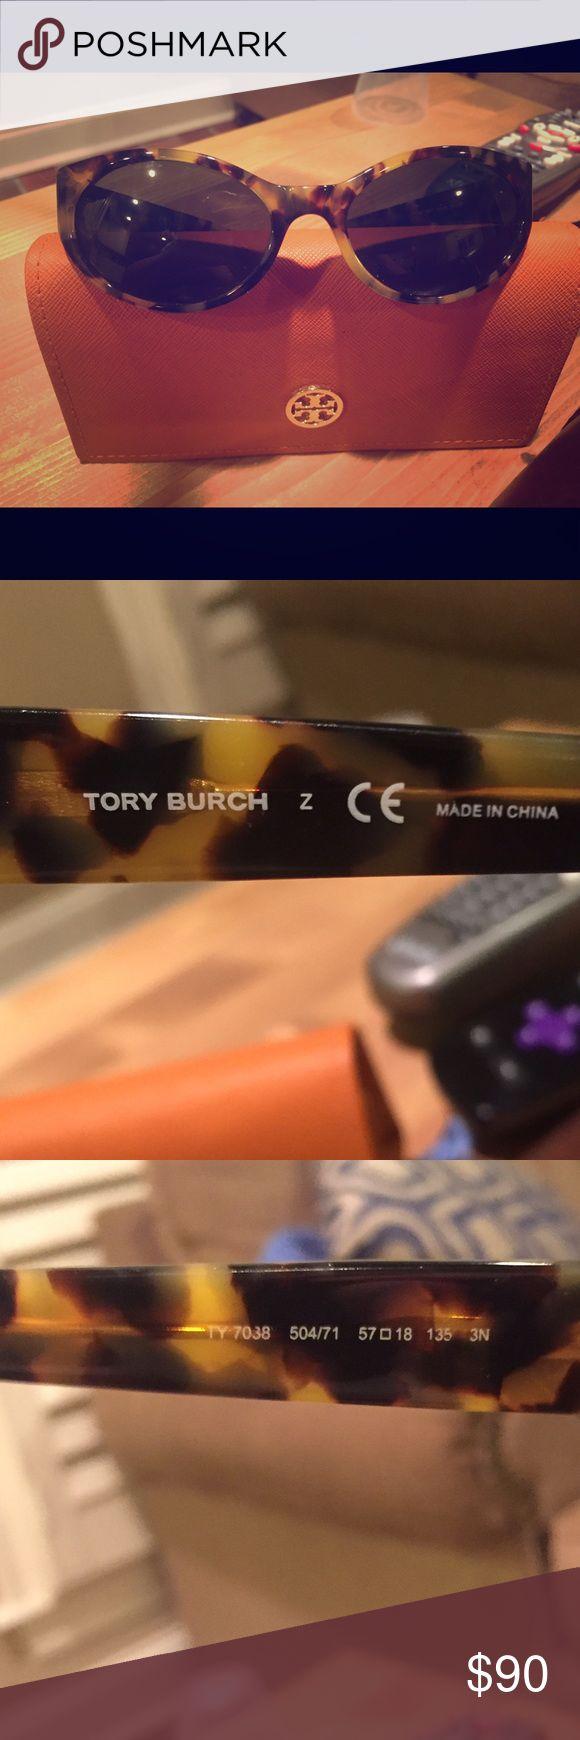 Tory Burch Sunglasses and Case Tory Burch Tortoise Shell Sunglasses with case! Tory Burch Accessories Sunglasses